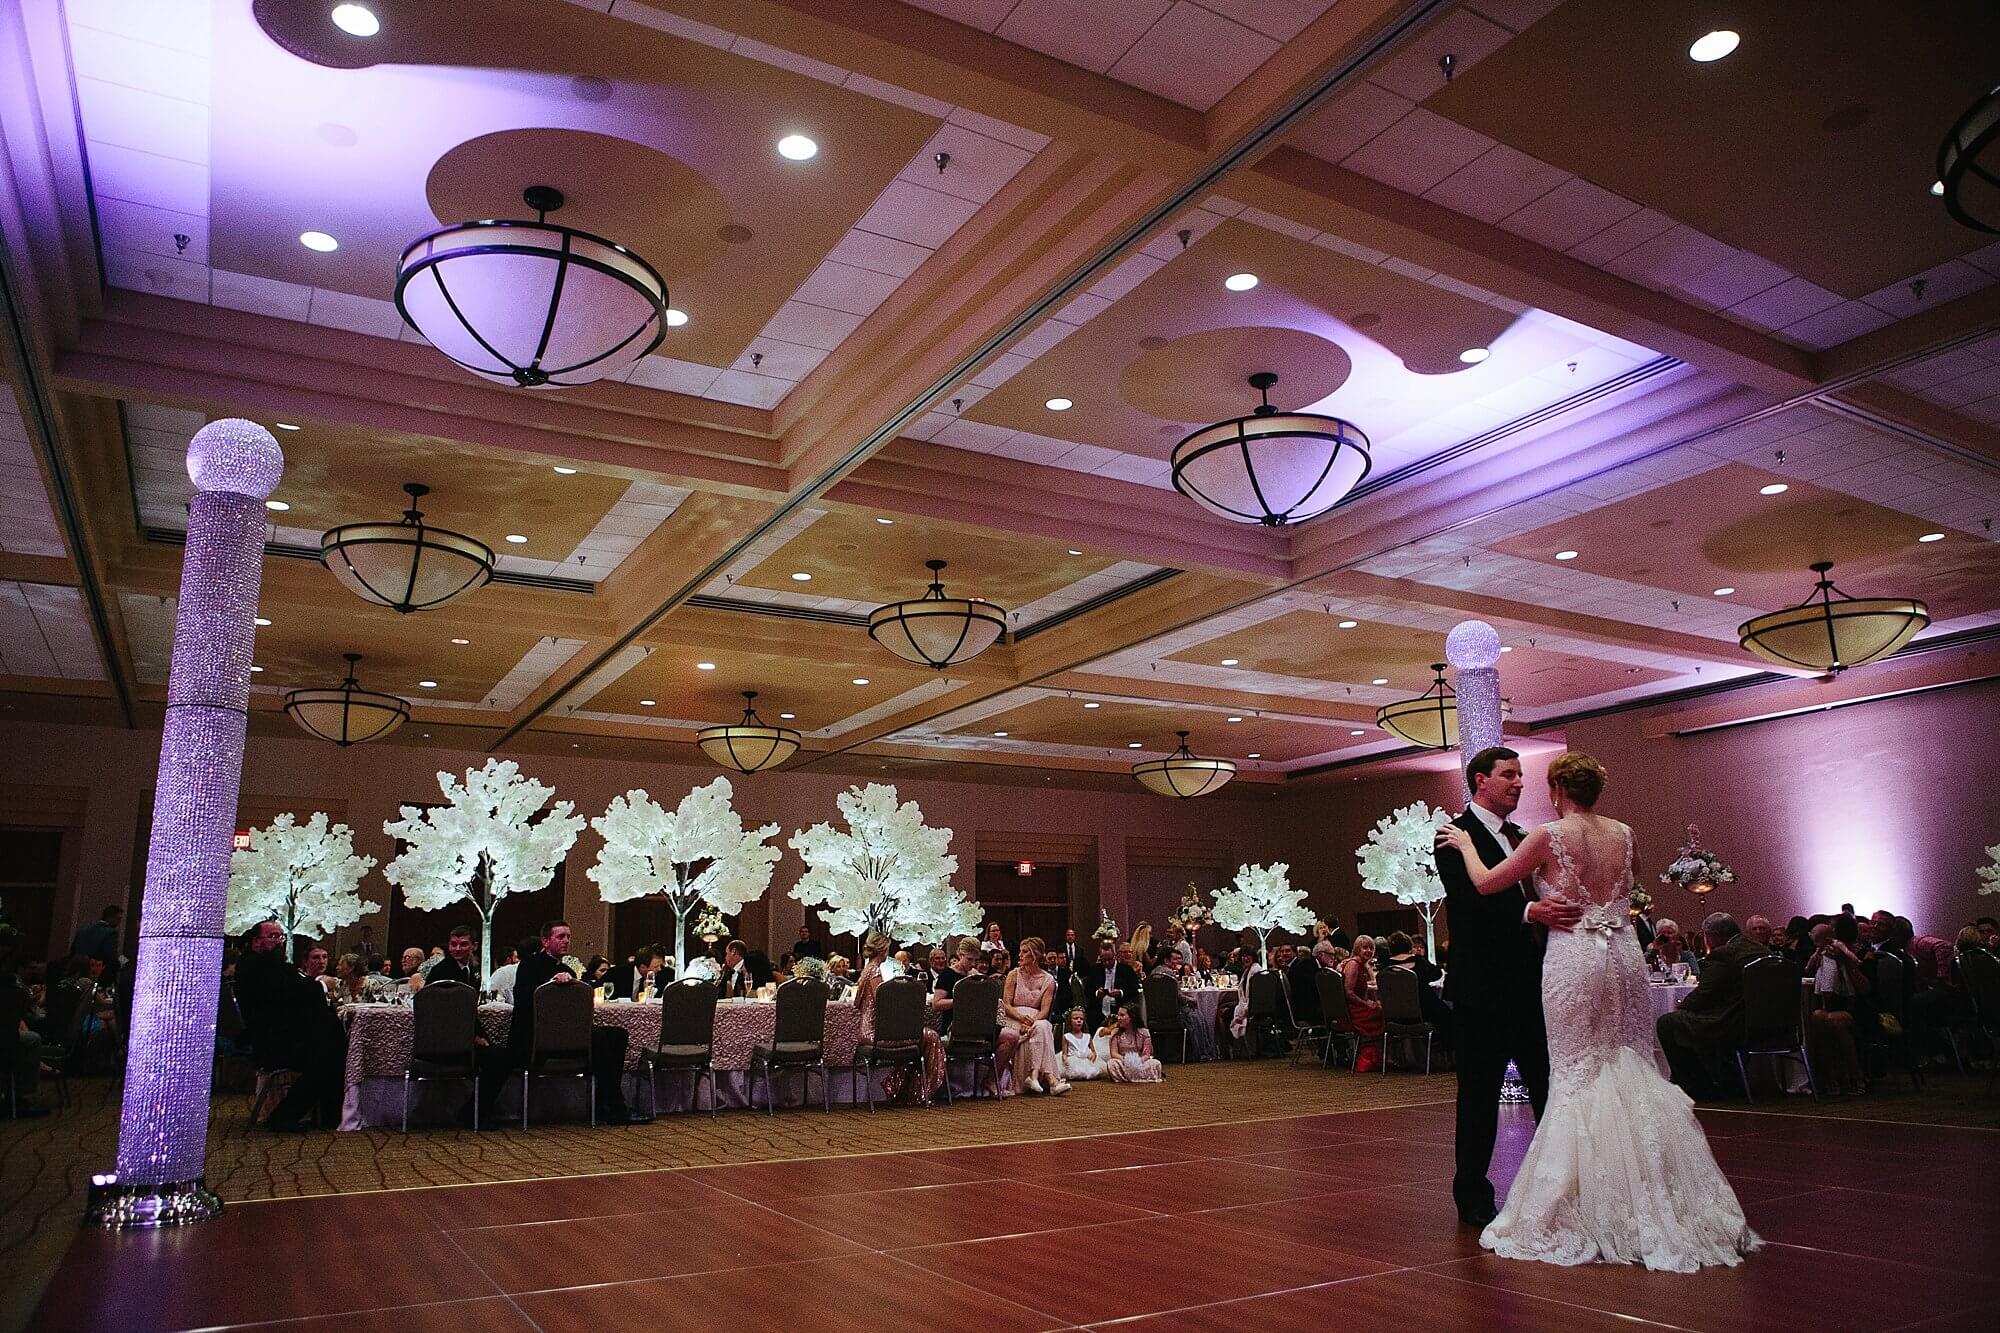 The Cornhusker Hotel Lincoln, Nebraska Wedding  |  Dana Osborne Design Wedding Invitations